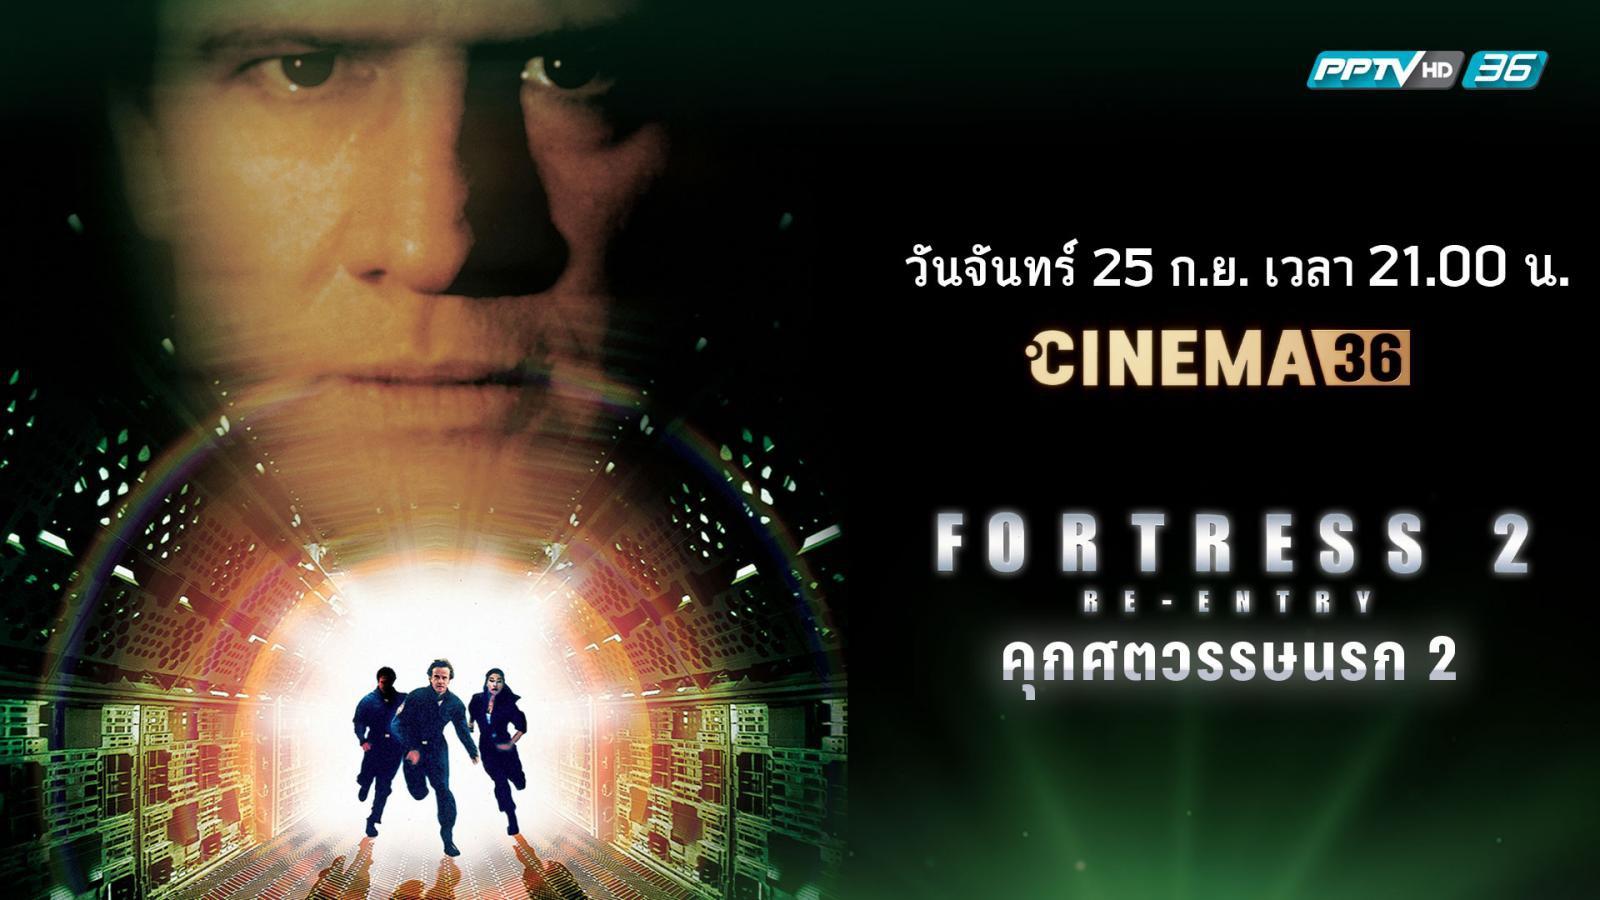 FORTRESS 2: RE ENTRY คุกศตวรรษนรก 2